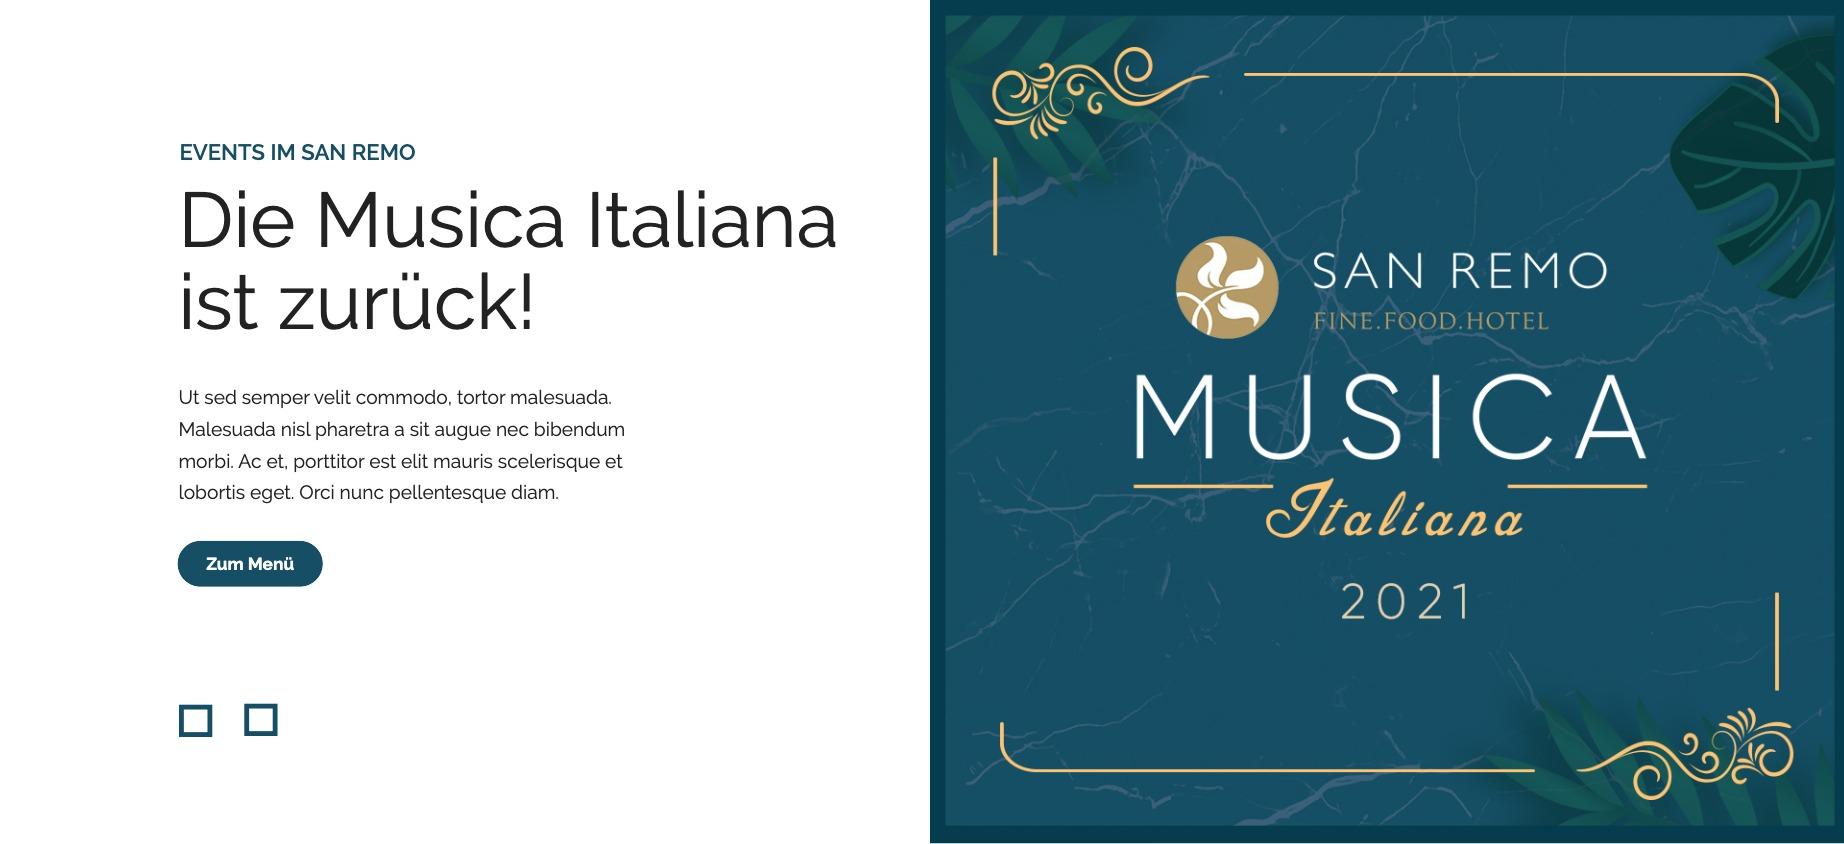 Bild Musica Italiana